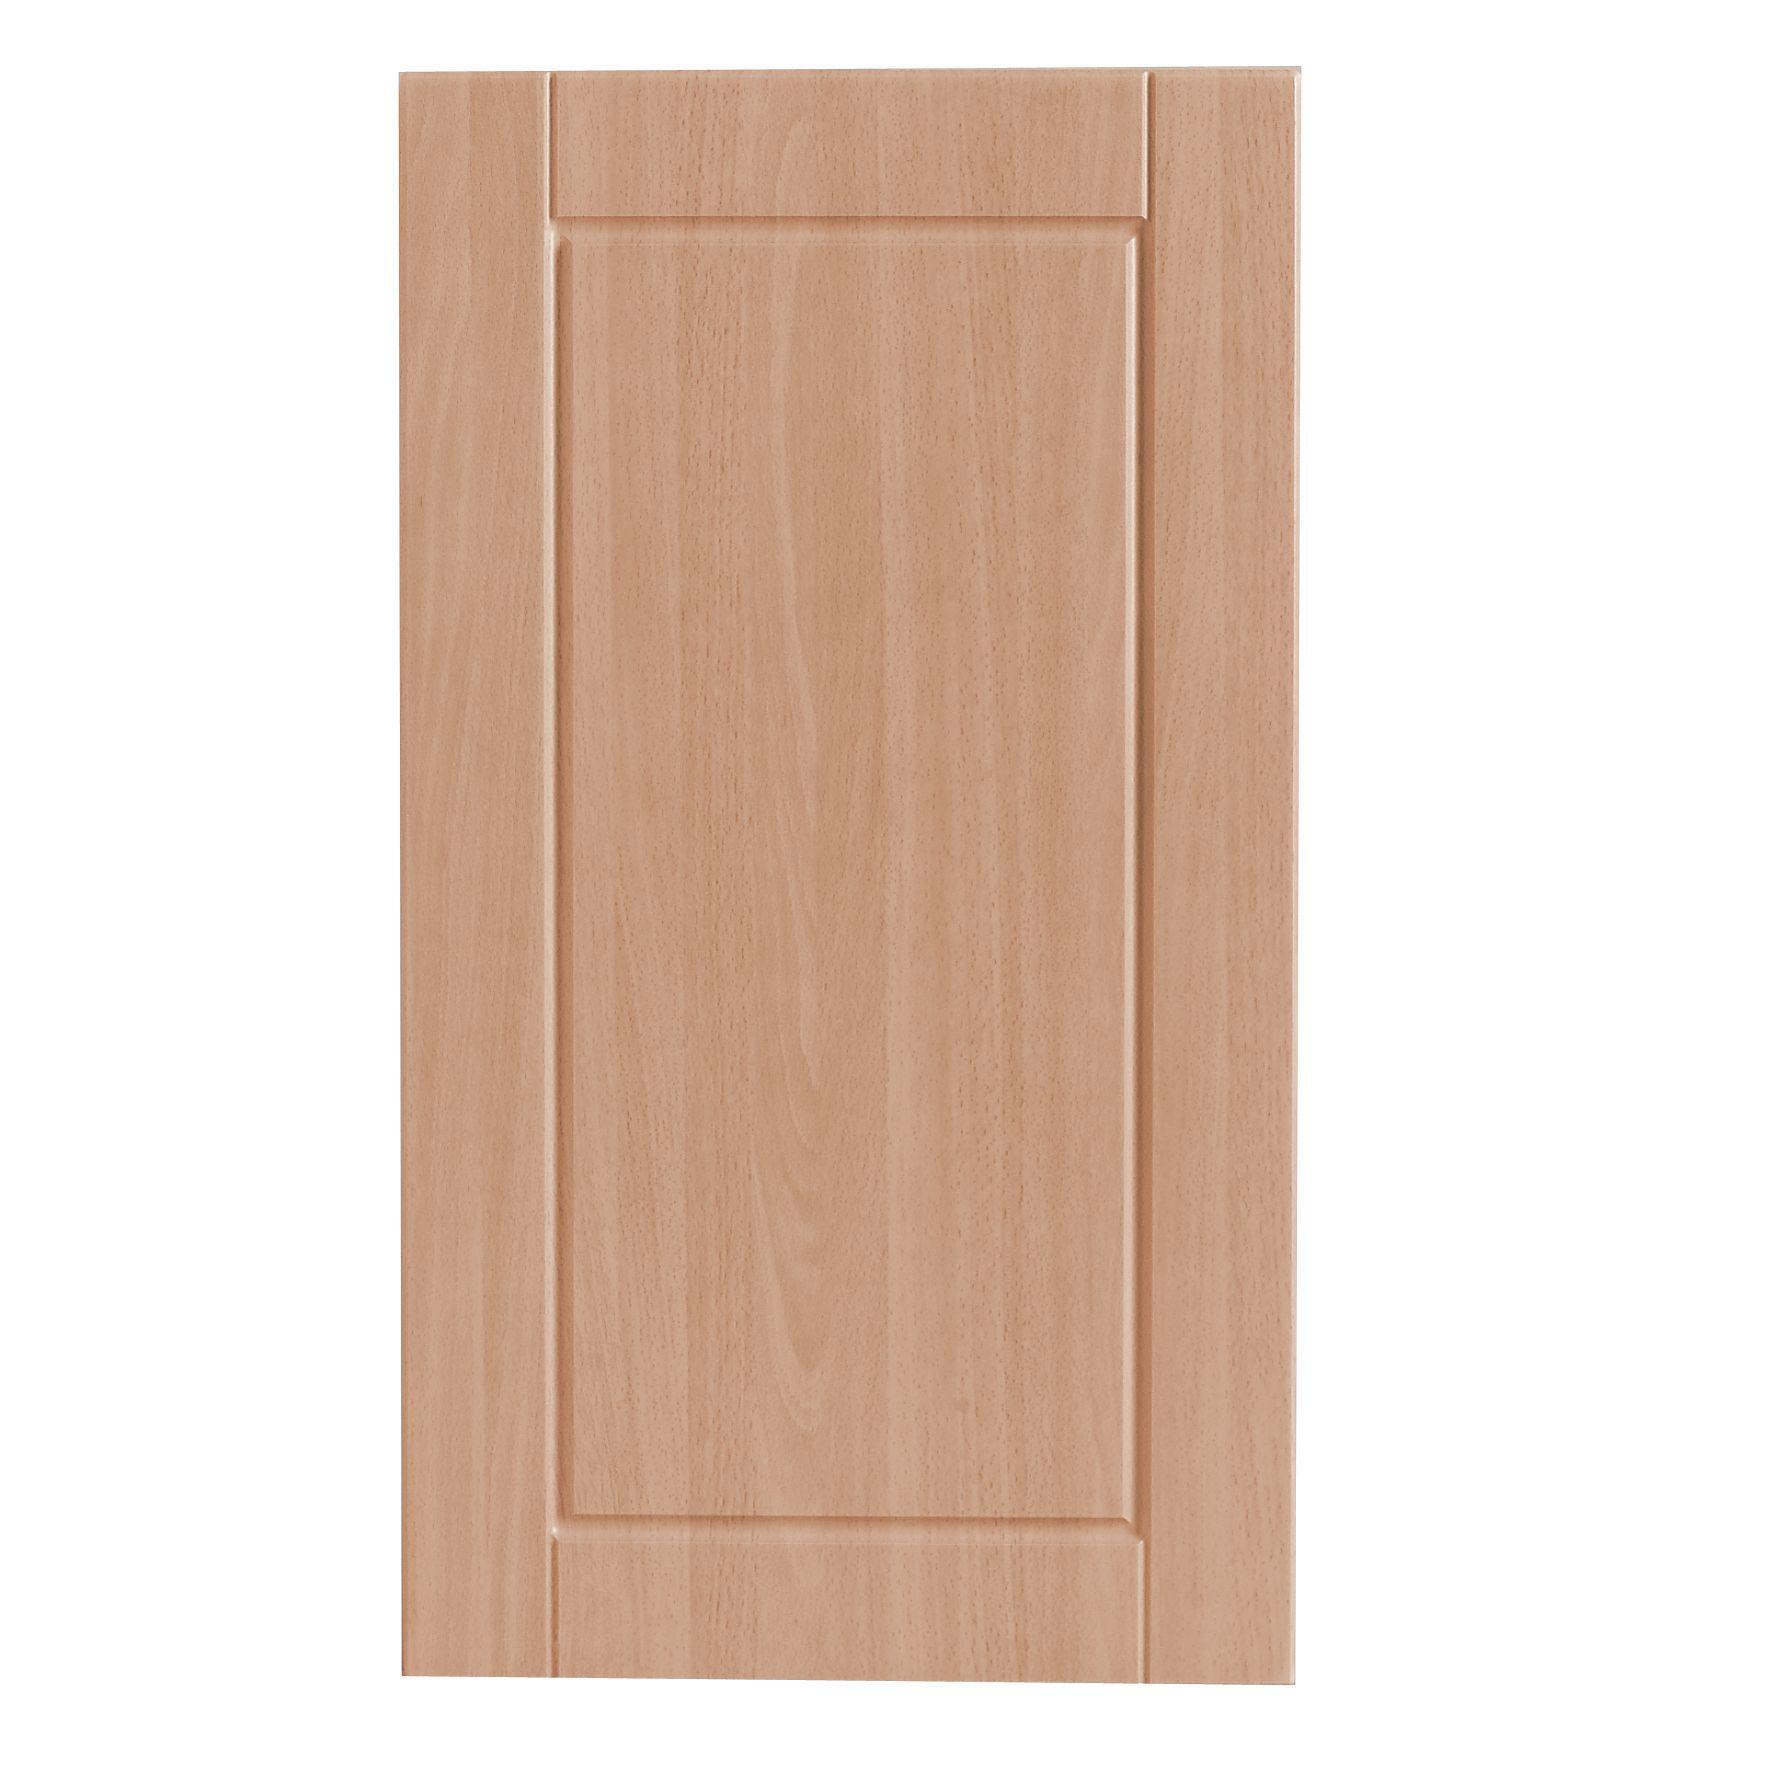 IT Kitchens Chilton Beech Effect Standard Door W 400mm Departments DIY A